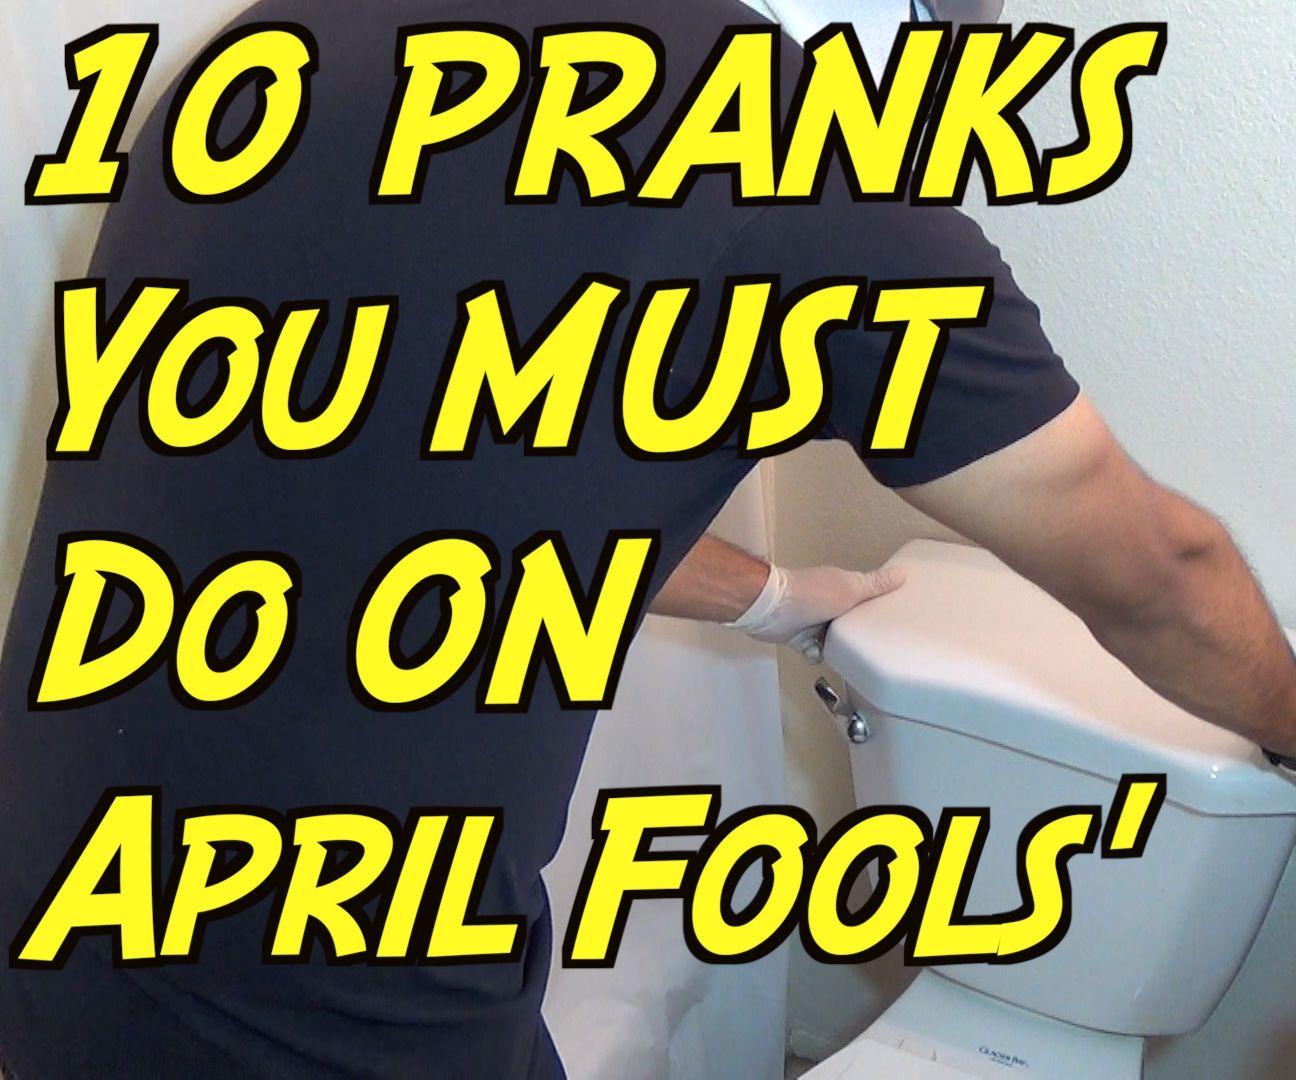 10 Simple April Fools' Day Pranks - HOW TO PRANK